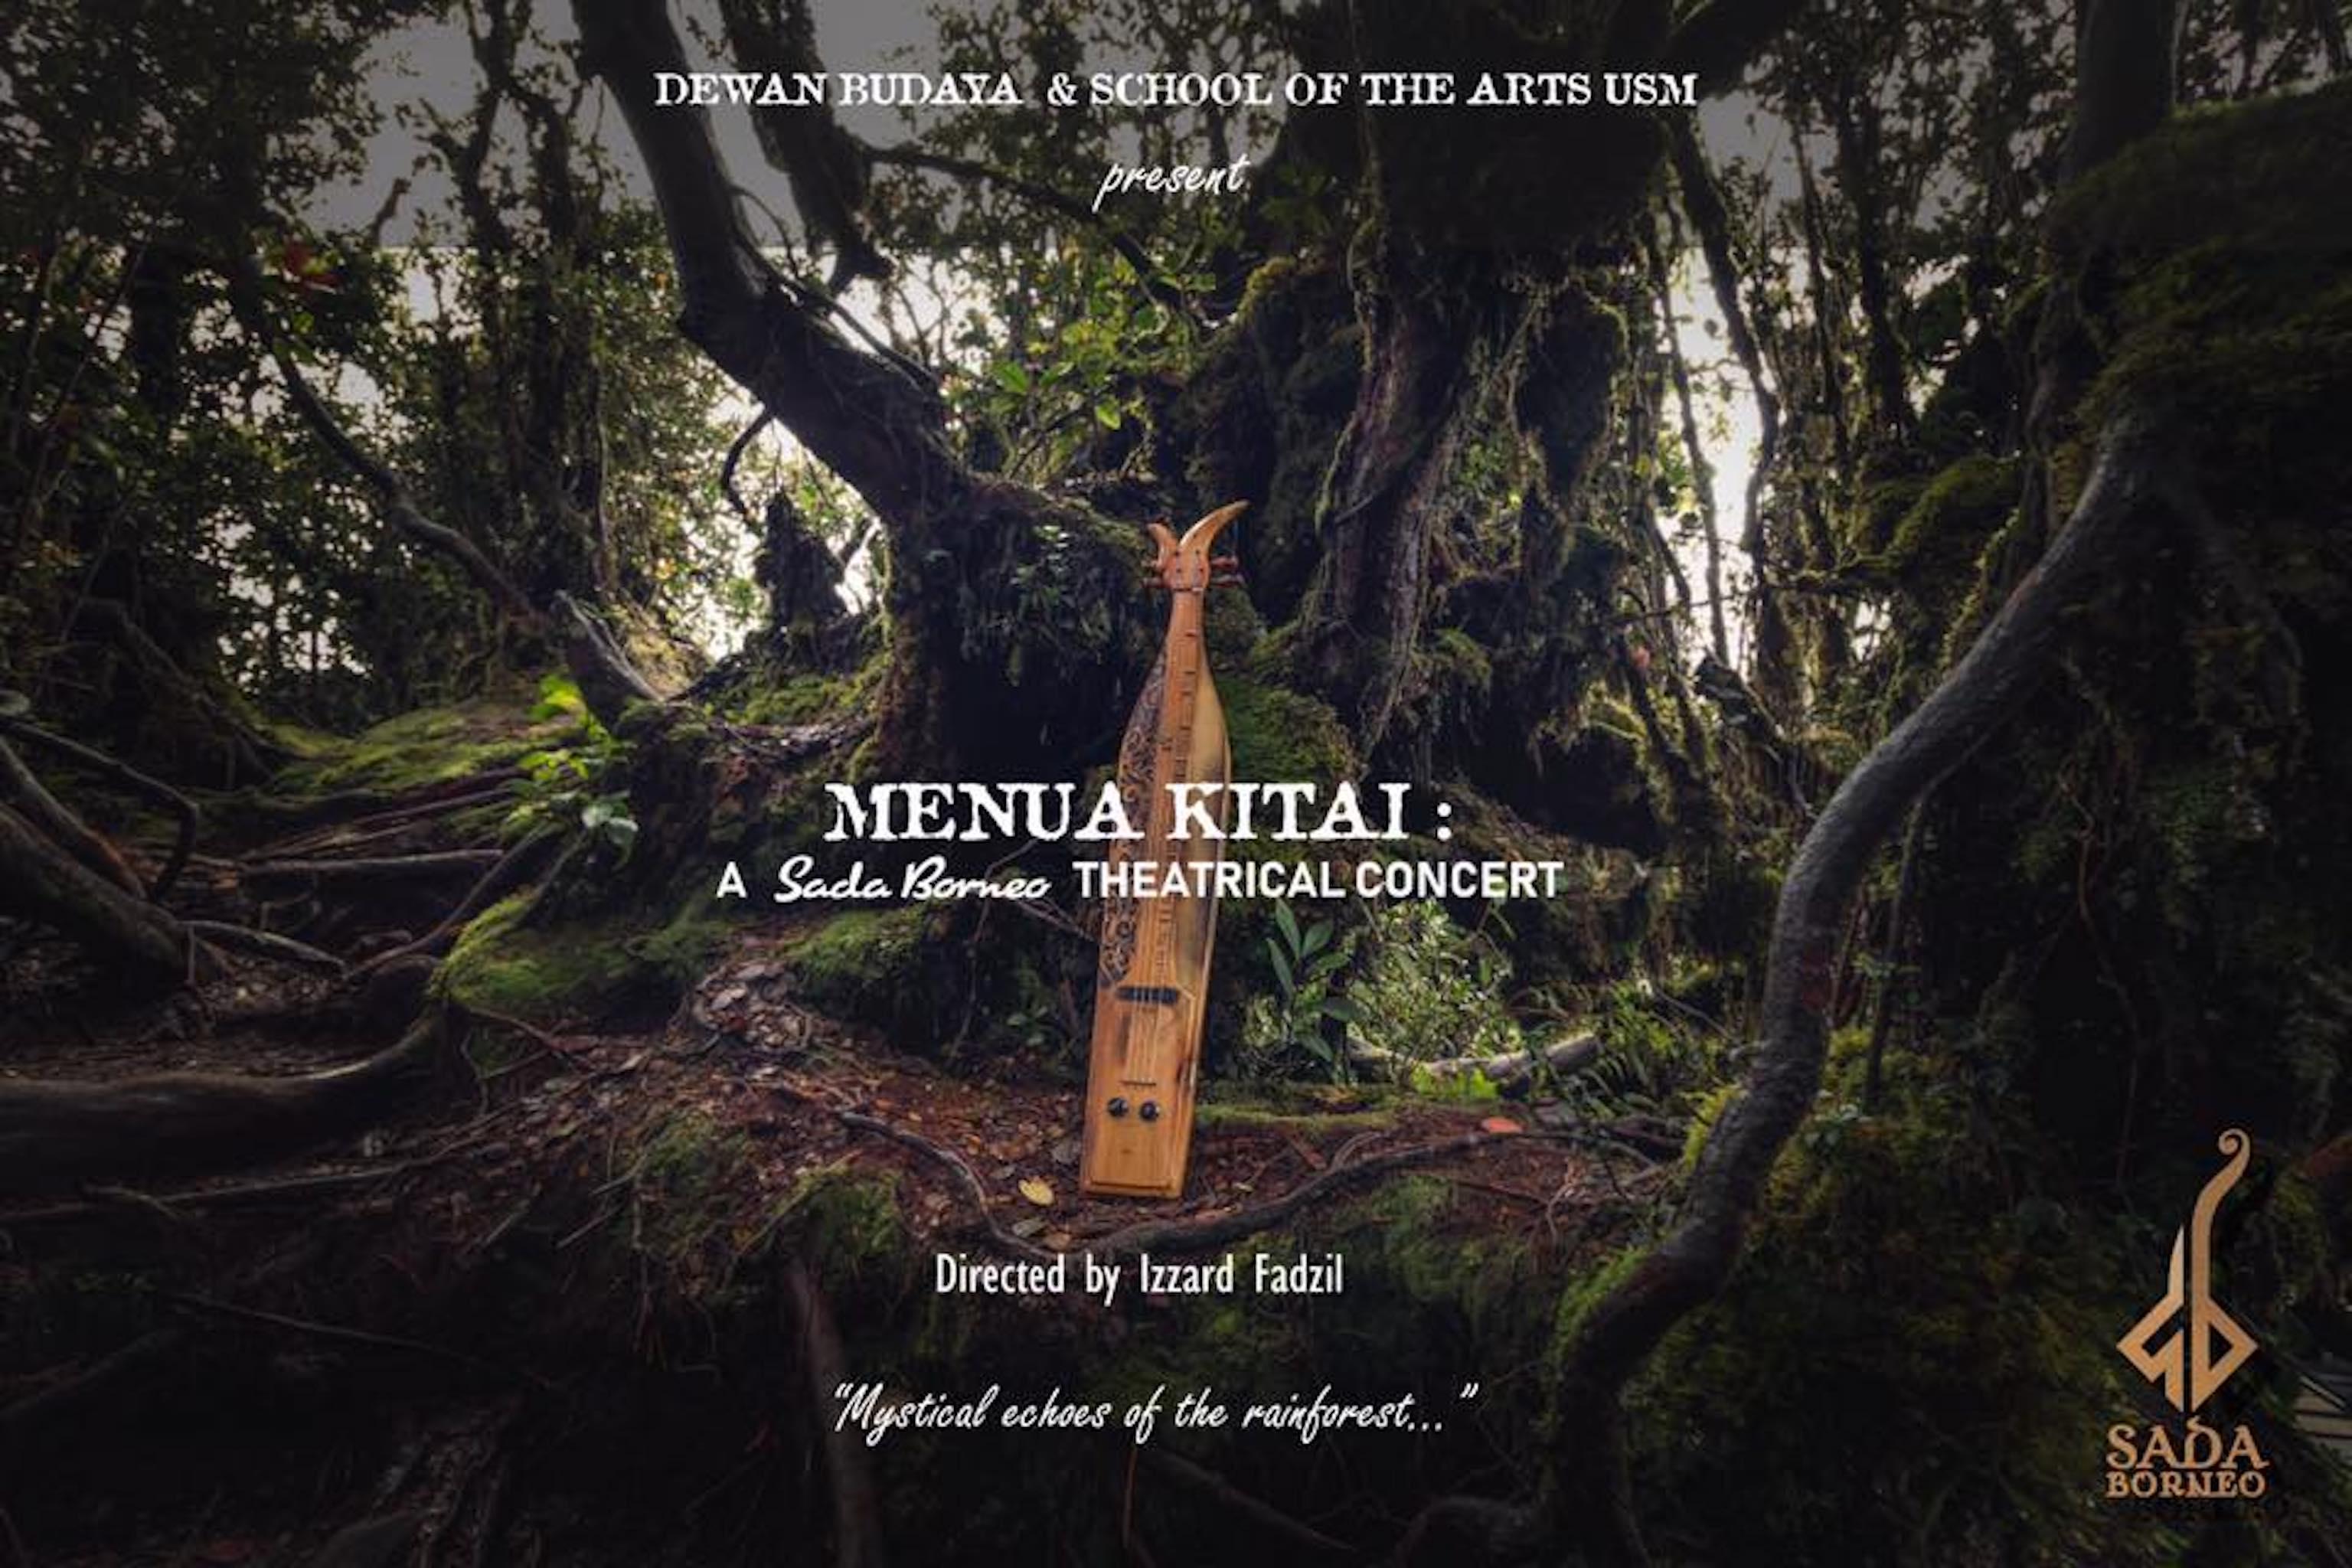 2018 Menua Kitai A Sada Borneo Theatrical Concert cover